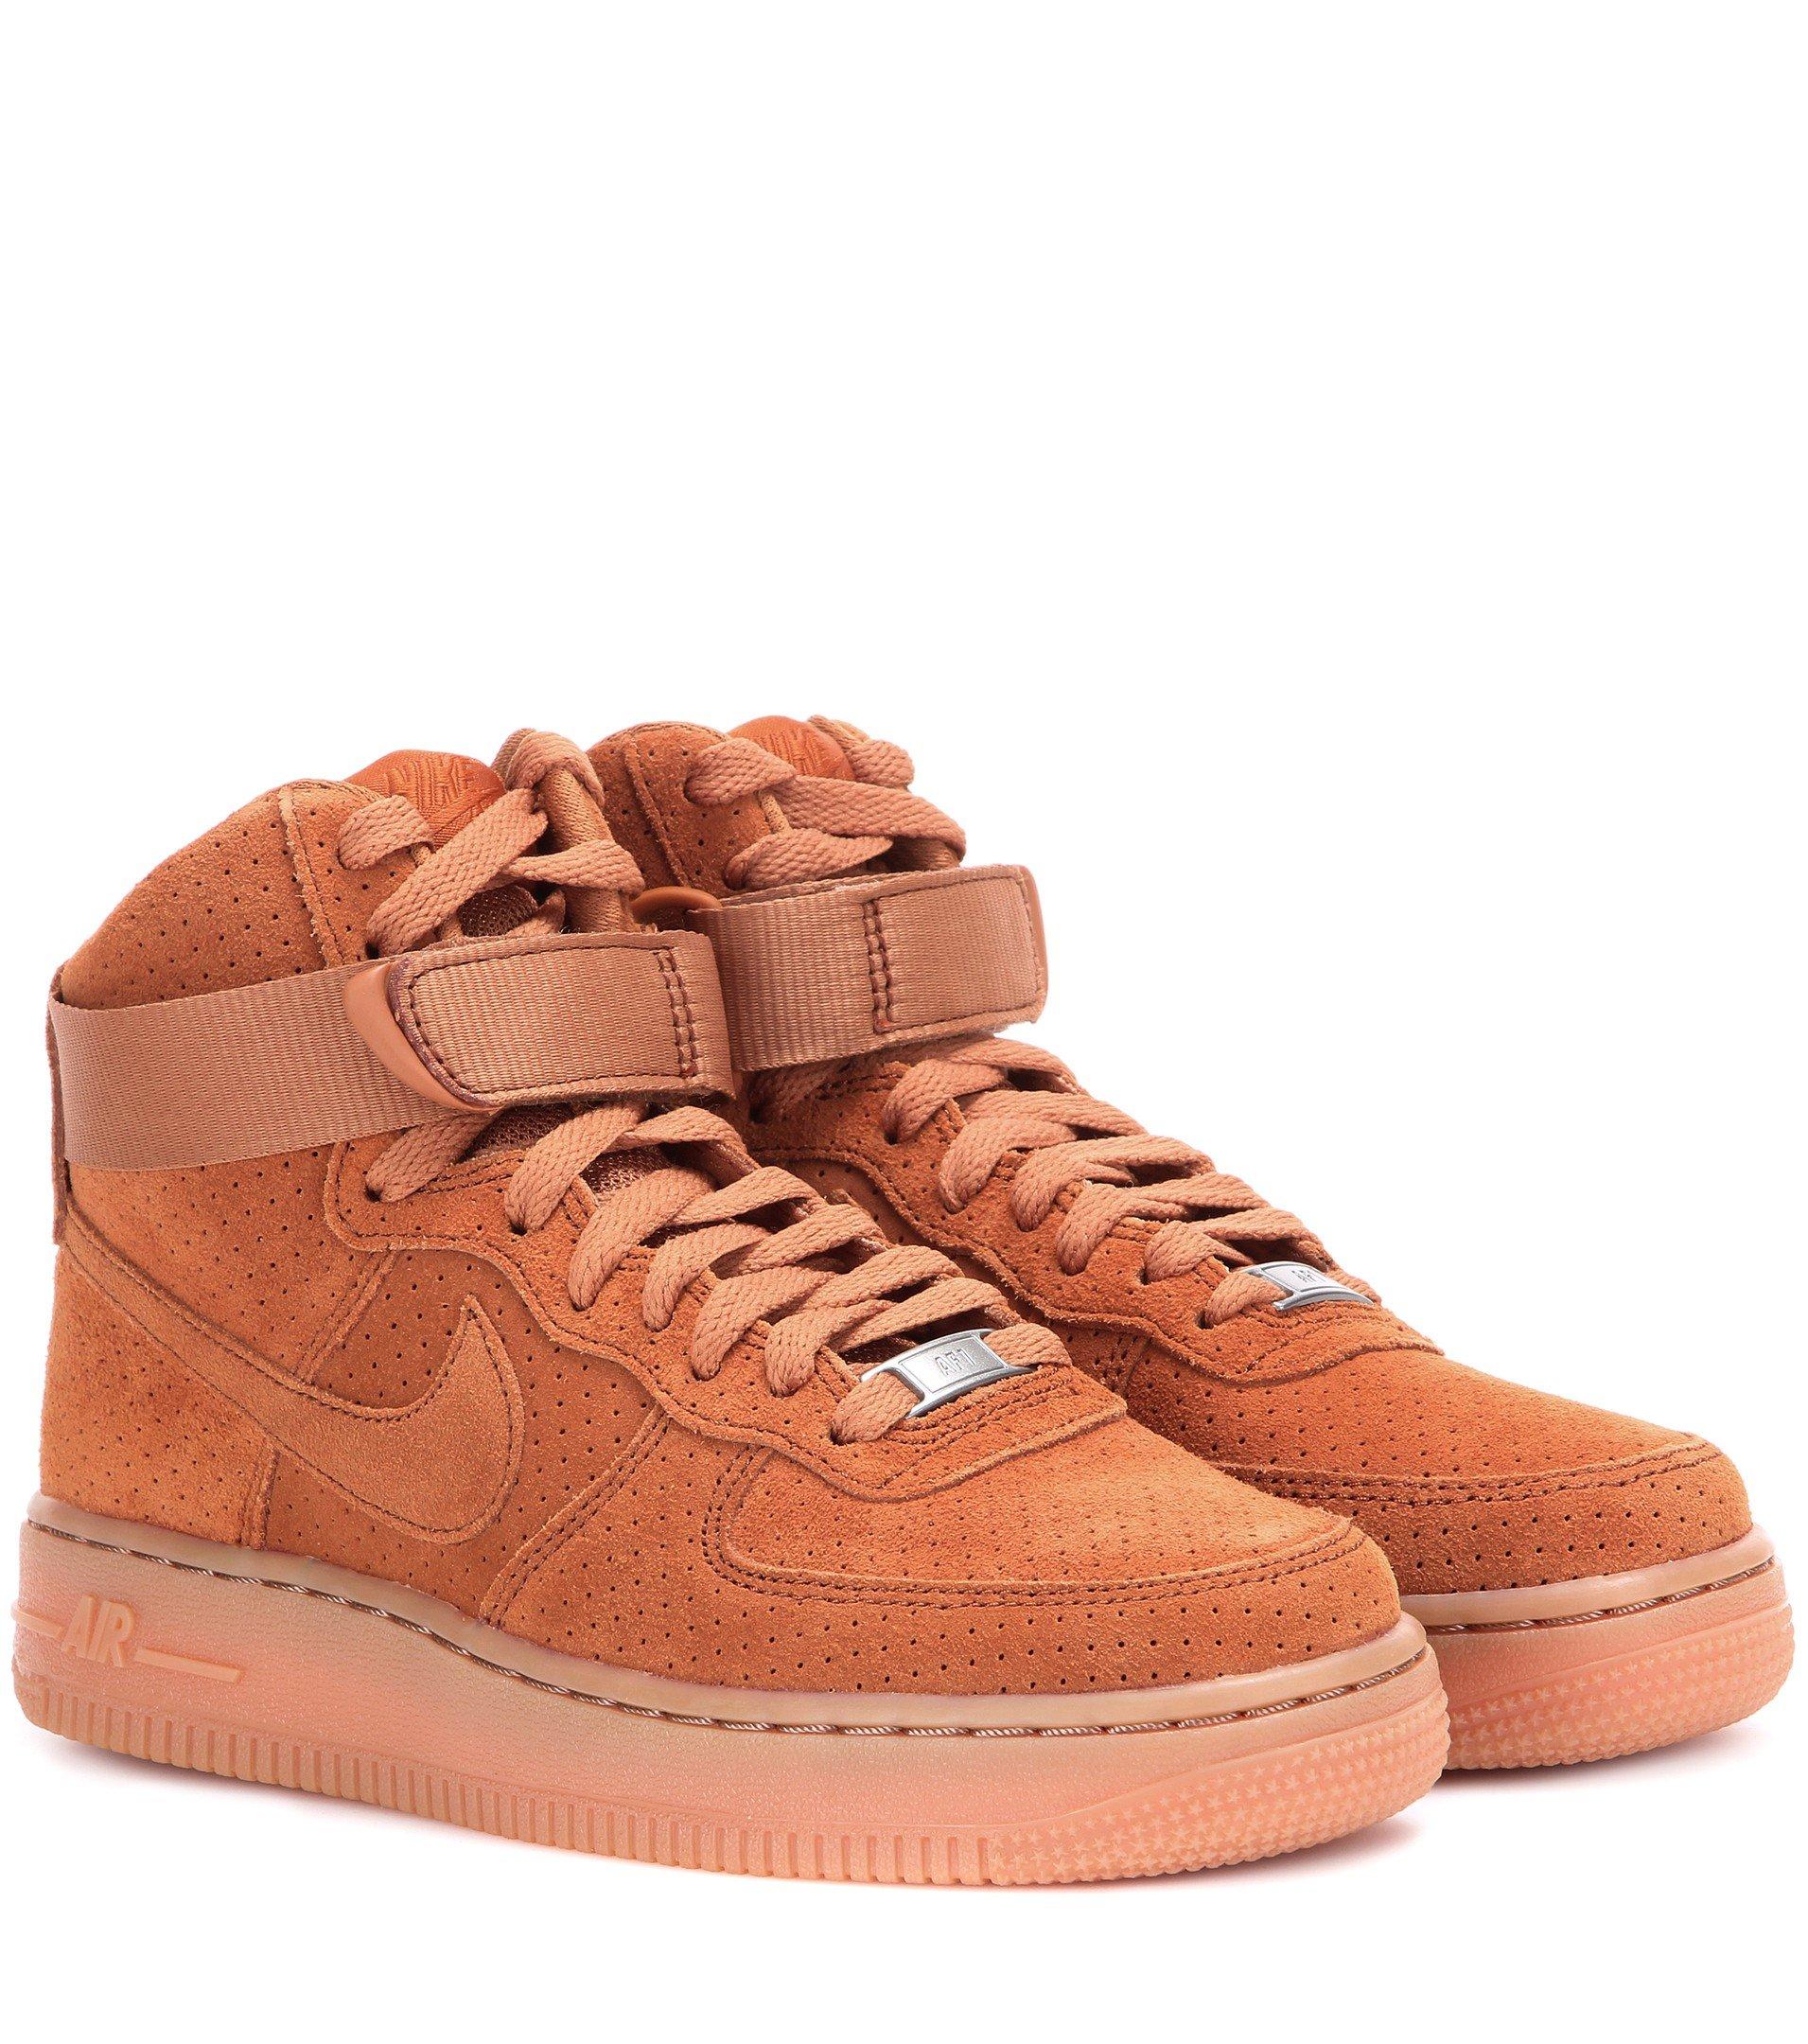 lyst nike air force 1 suede high top sneakers in brown. Black Bedroom Furniture Sets. Home Design Ideas